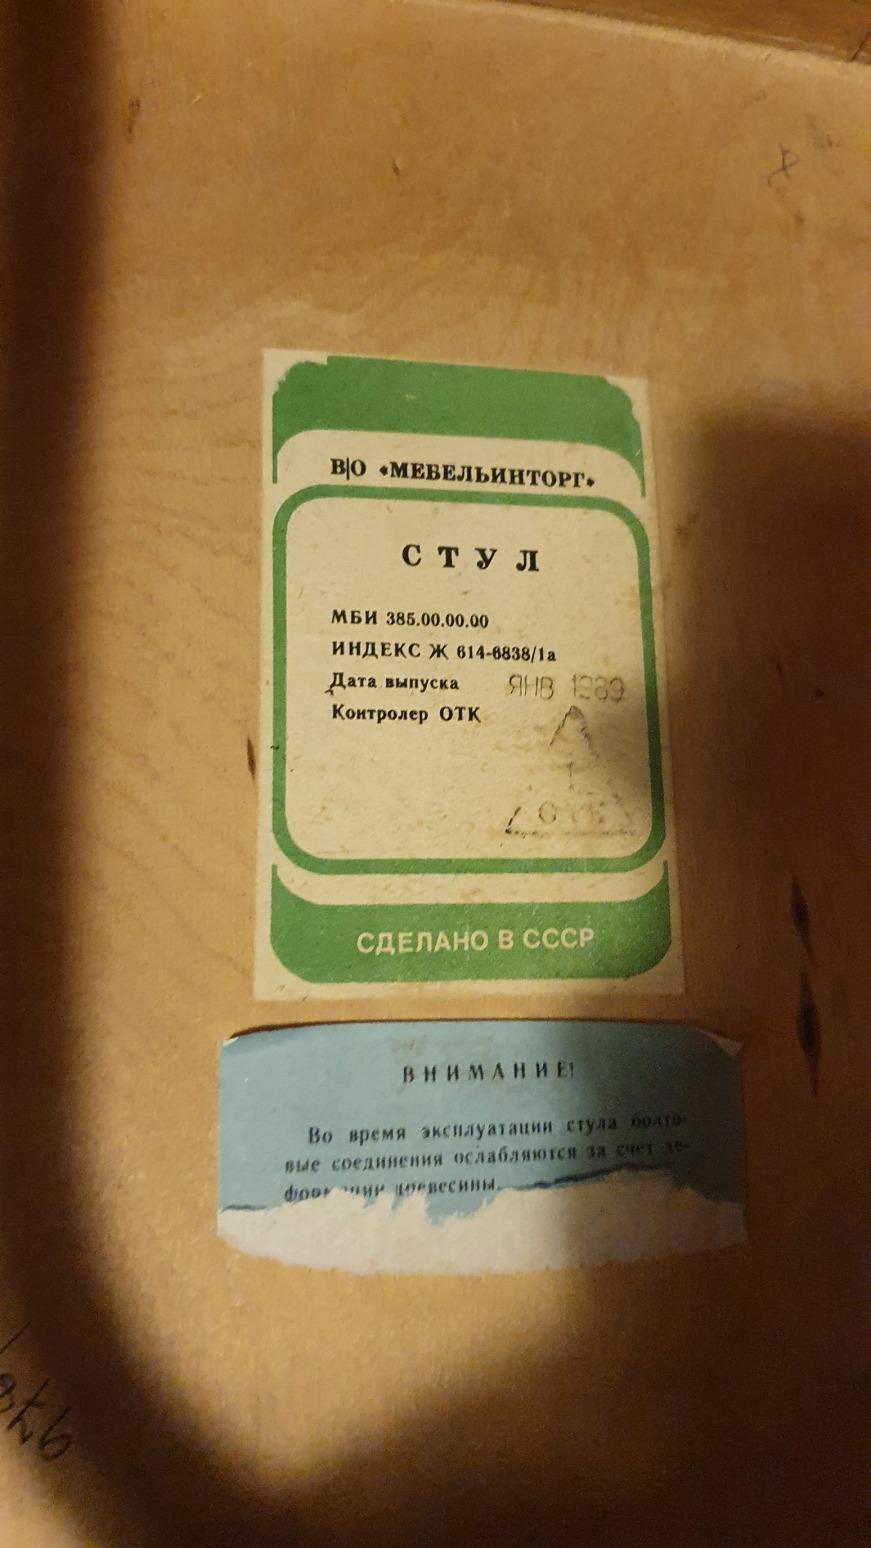 g210711003-Napric-Ceskou-Kanadou